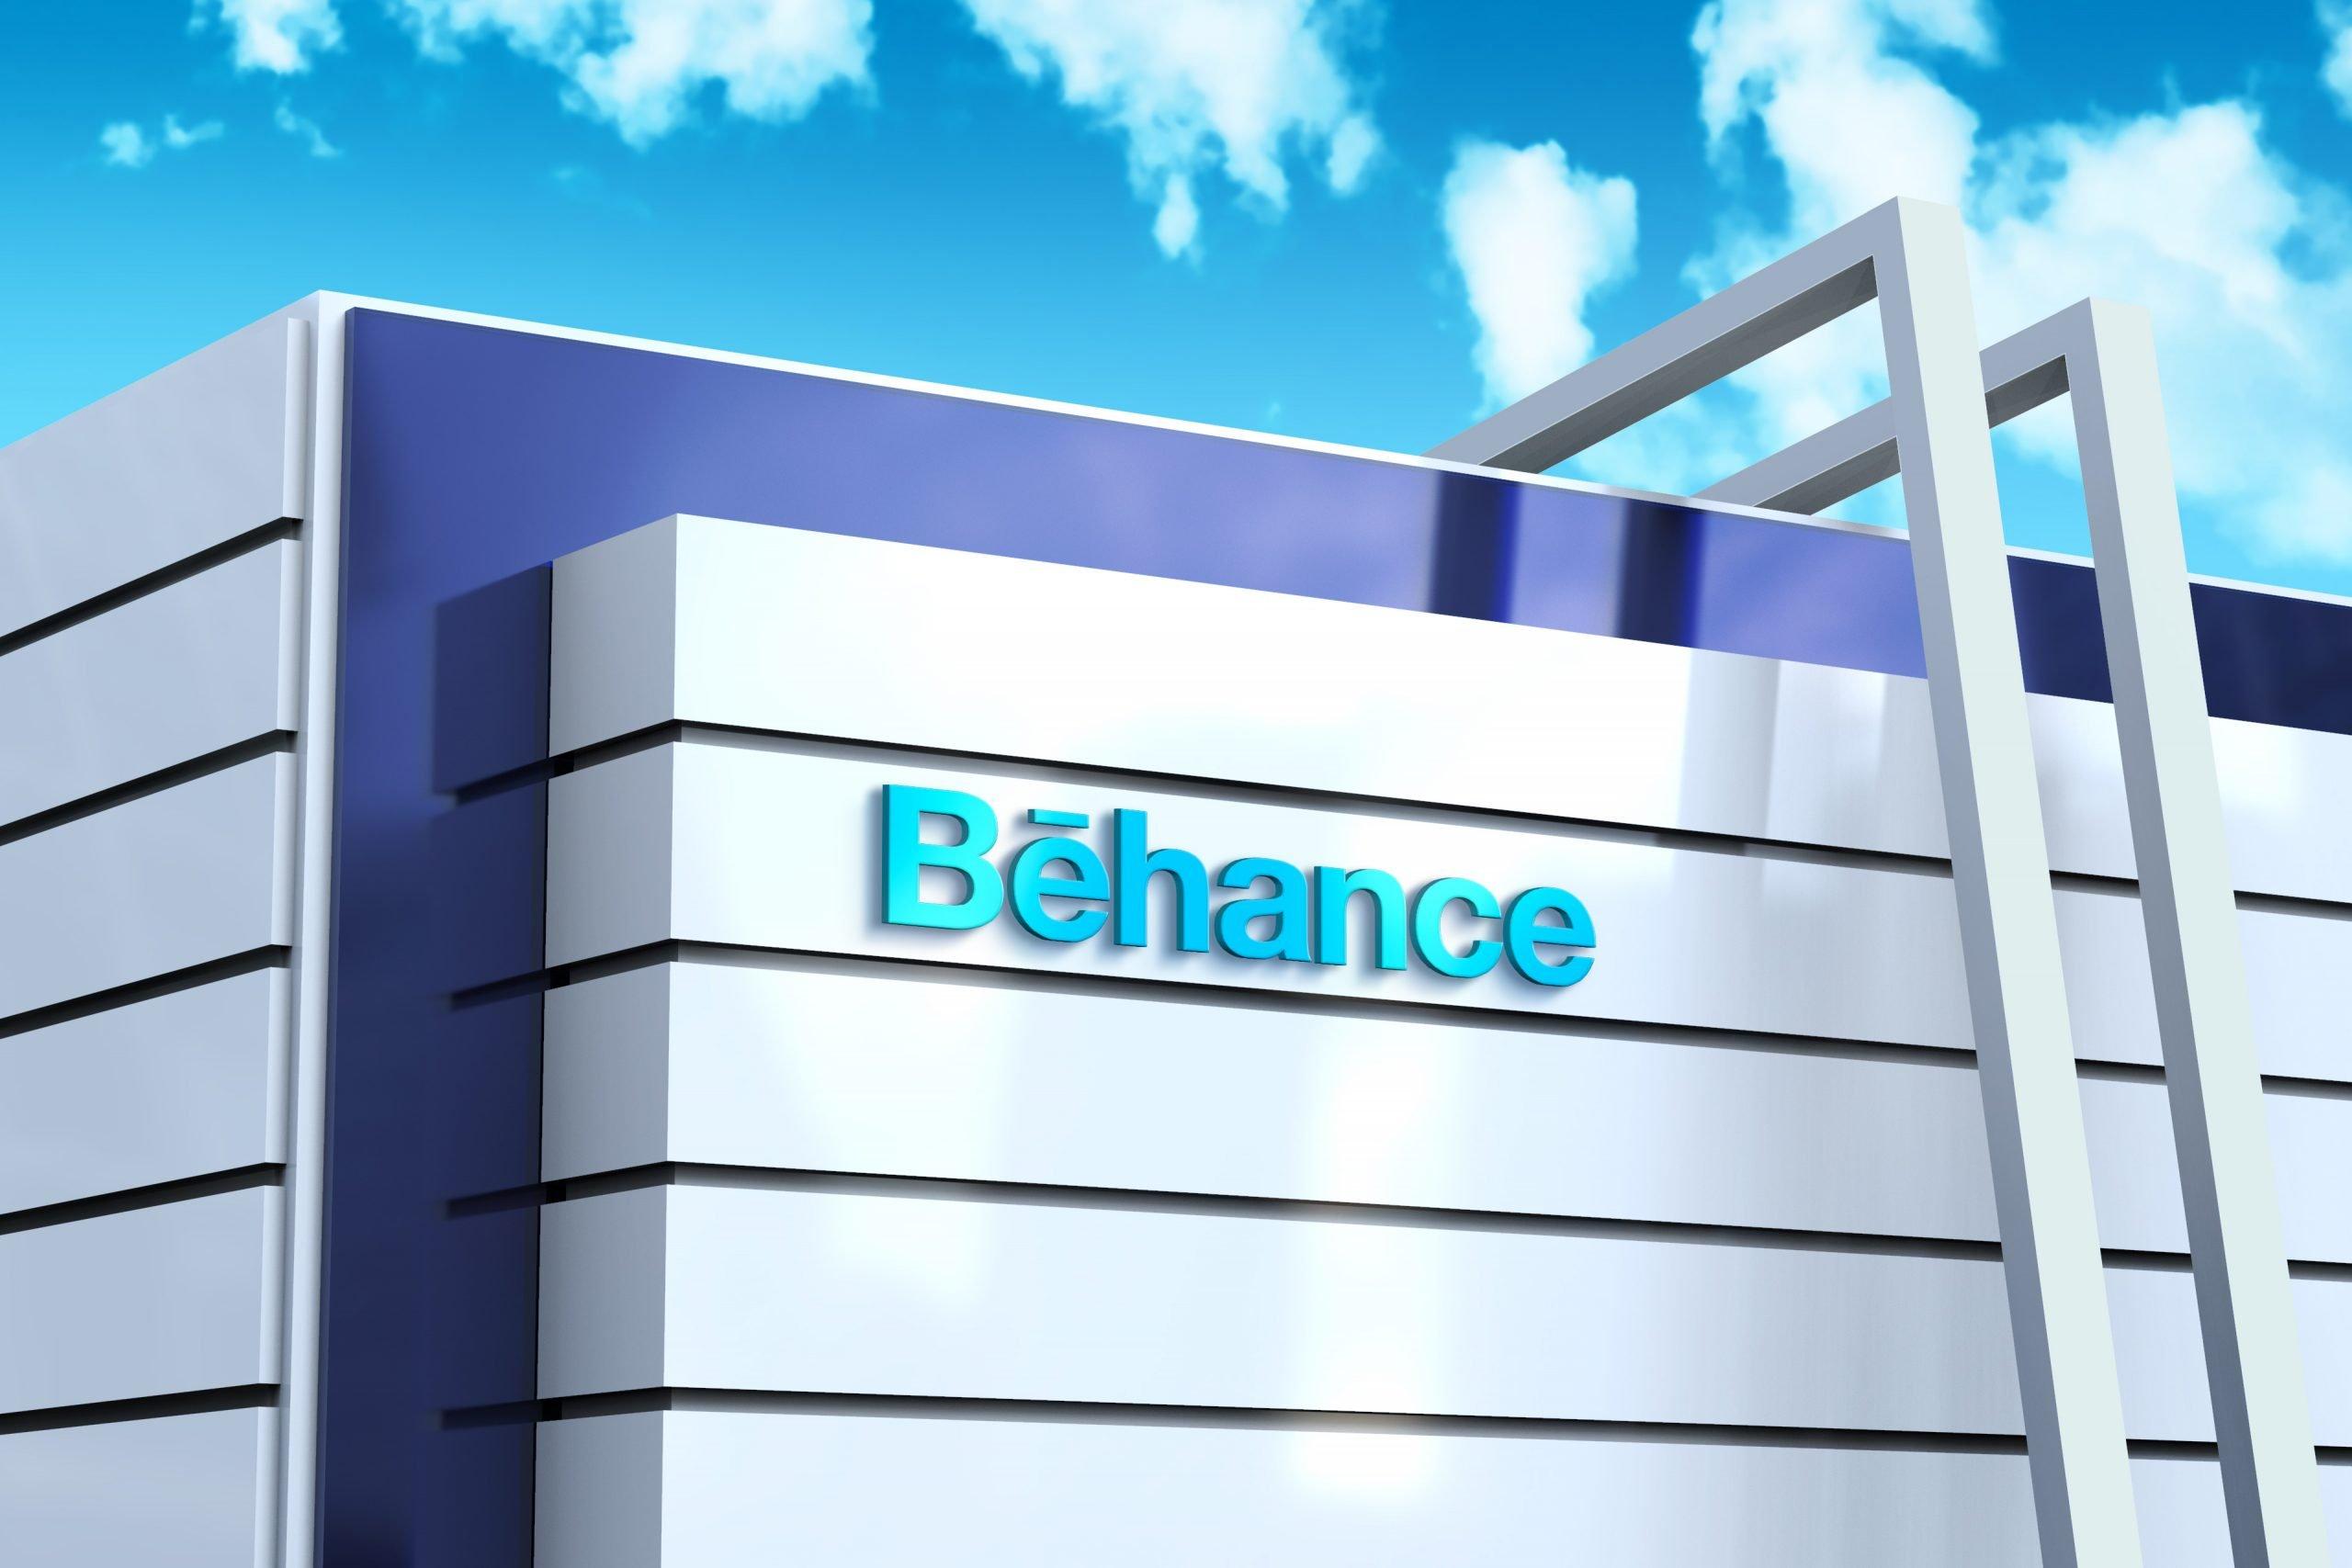 Behance-Logo-Example-Modern-Building-Architecture-Logo-Mockup